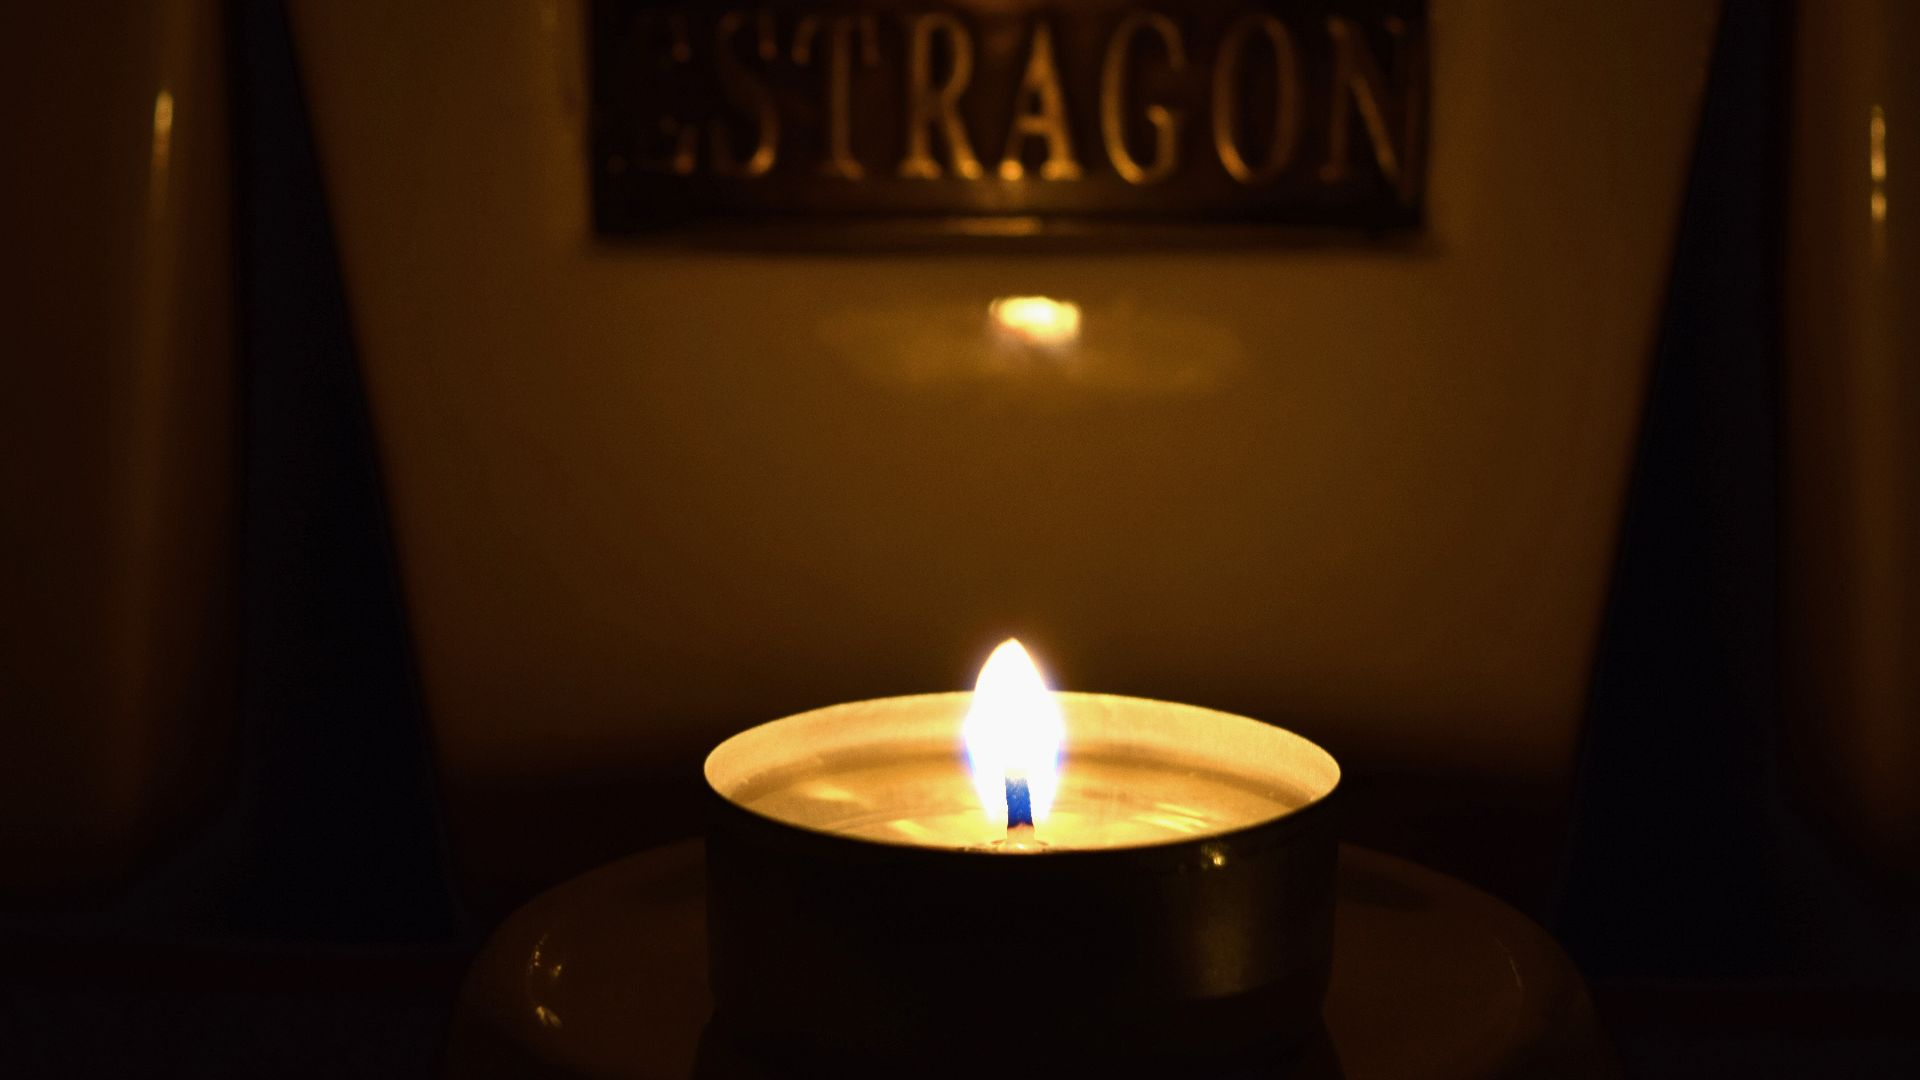 hygge candle diesel emissons